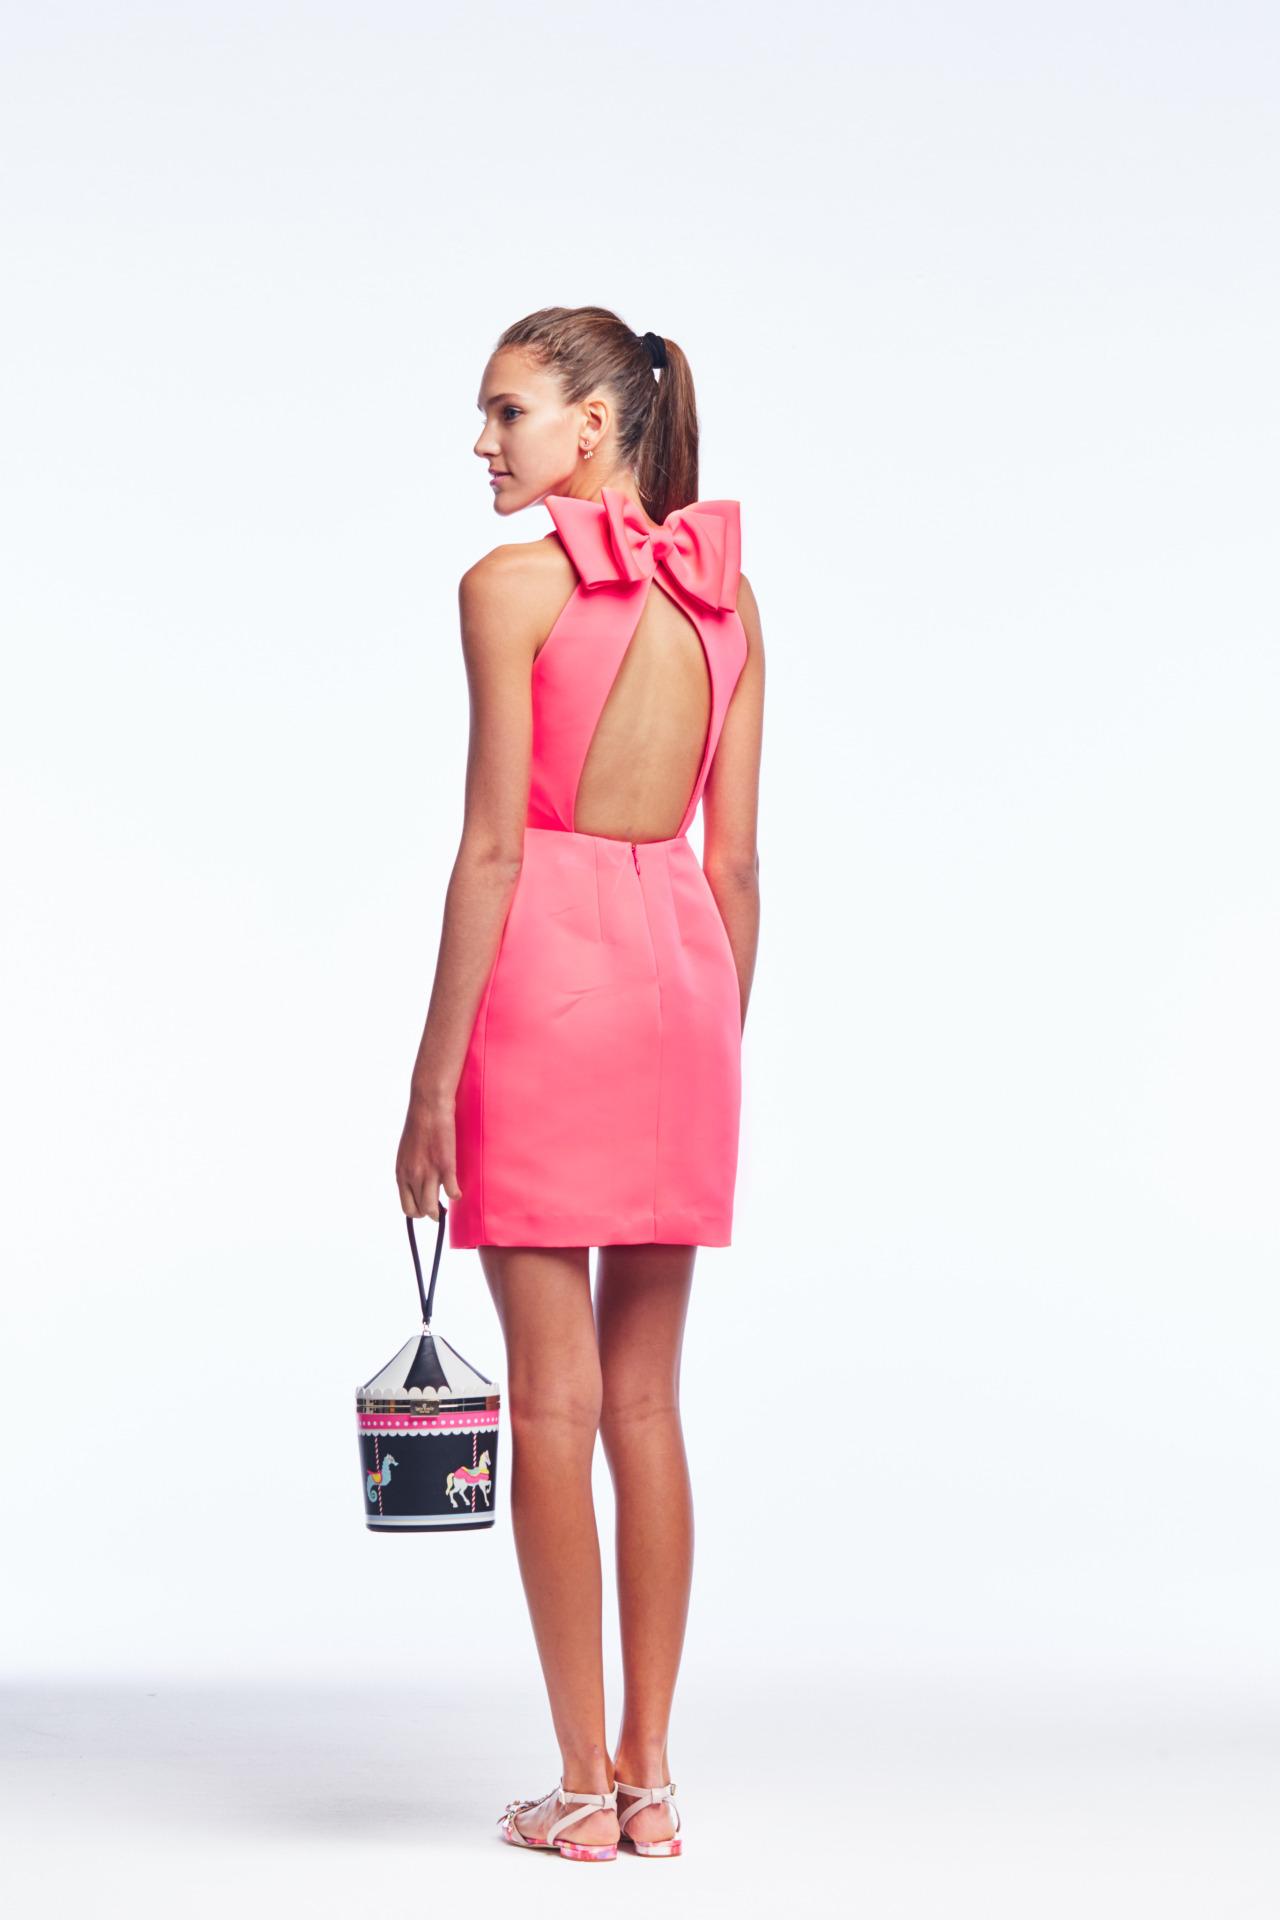 70ccaa736f26 kate spade spring summer 2016 pink bow back dress